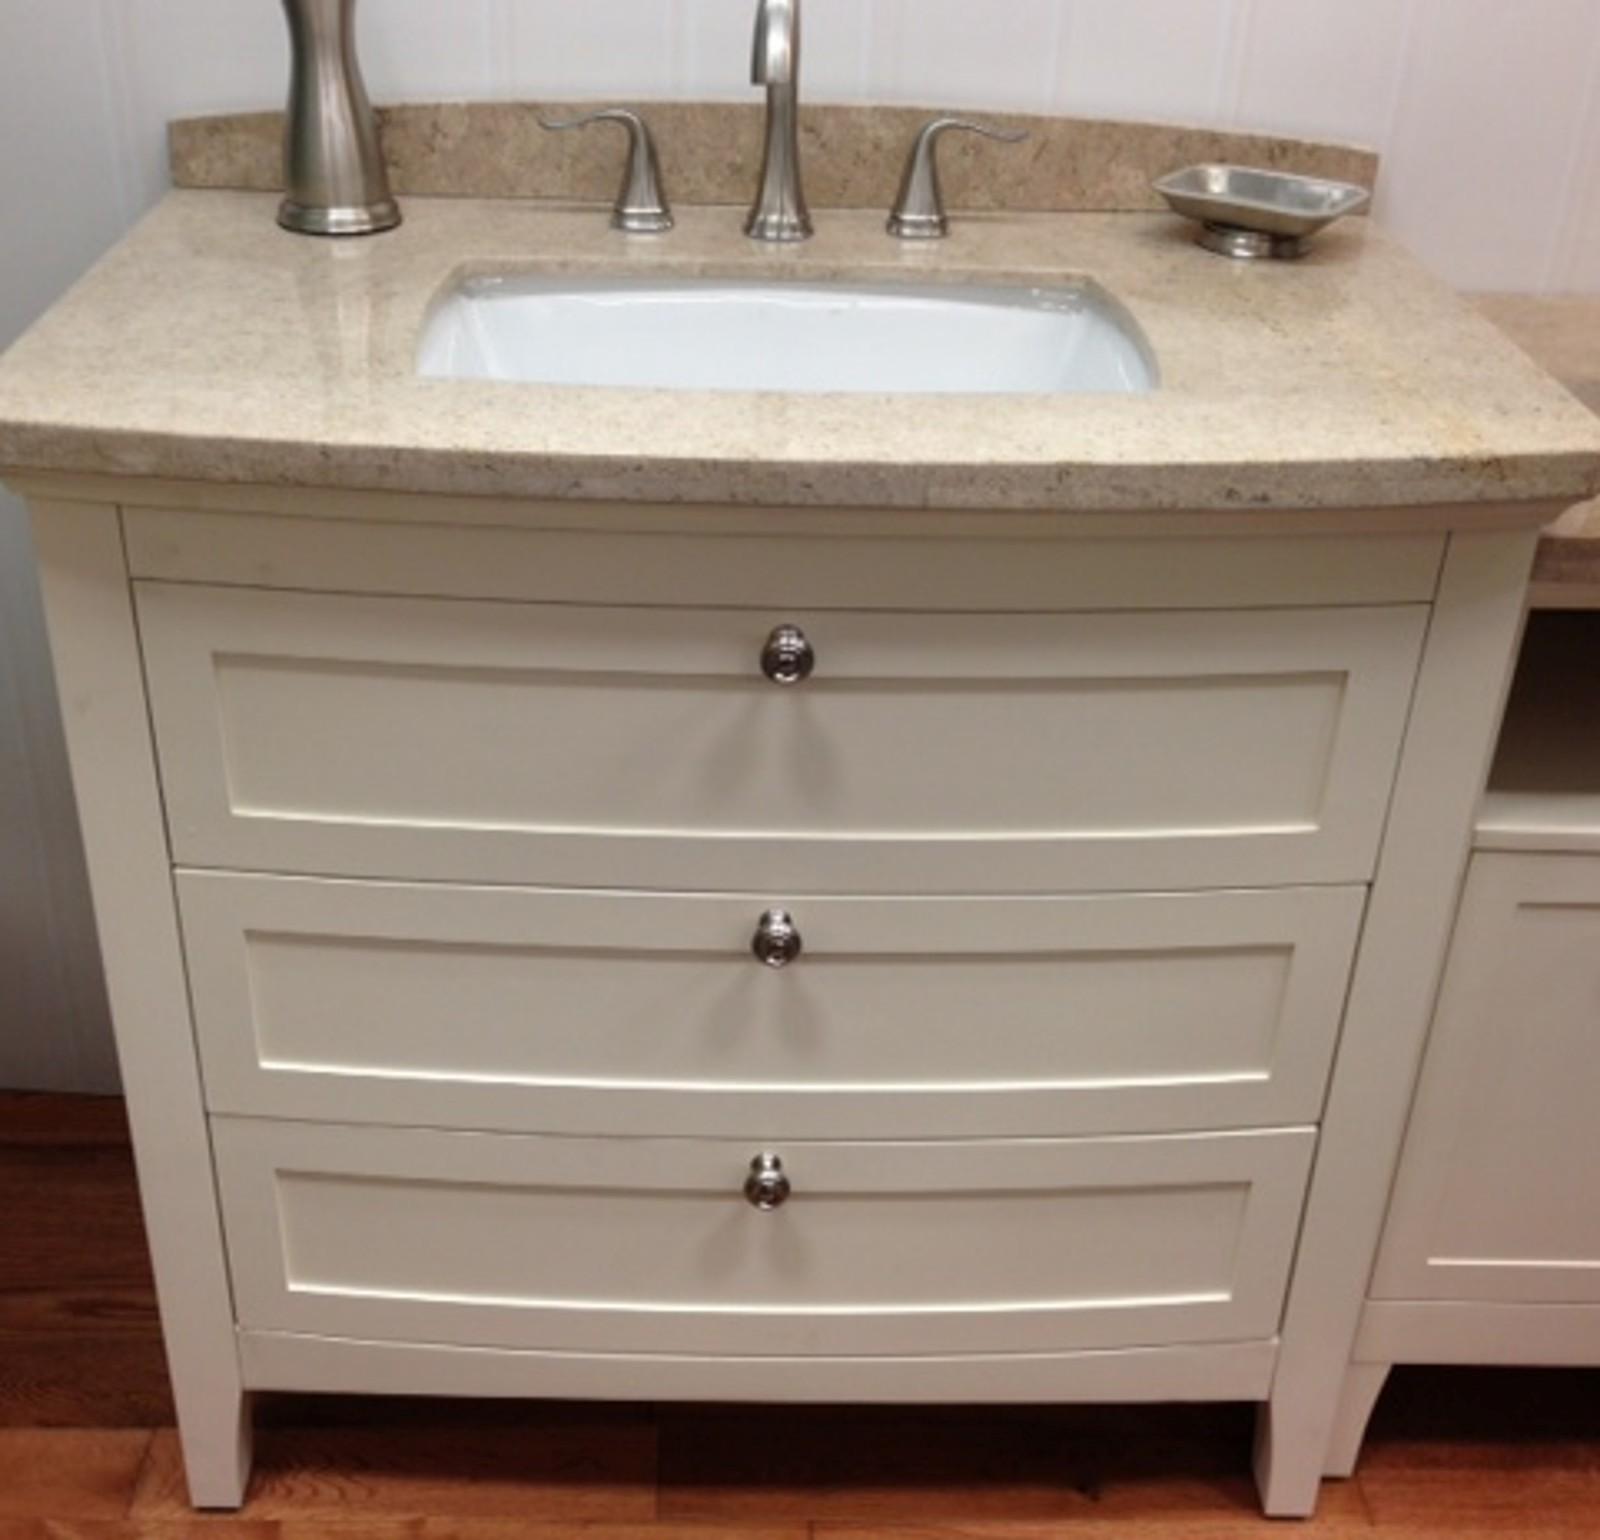 allen and roth bathroom vanities home interior blog rh rk rfabk mpeff melhorcompra store